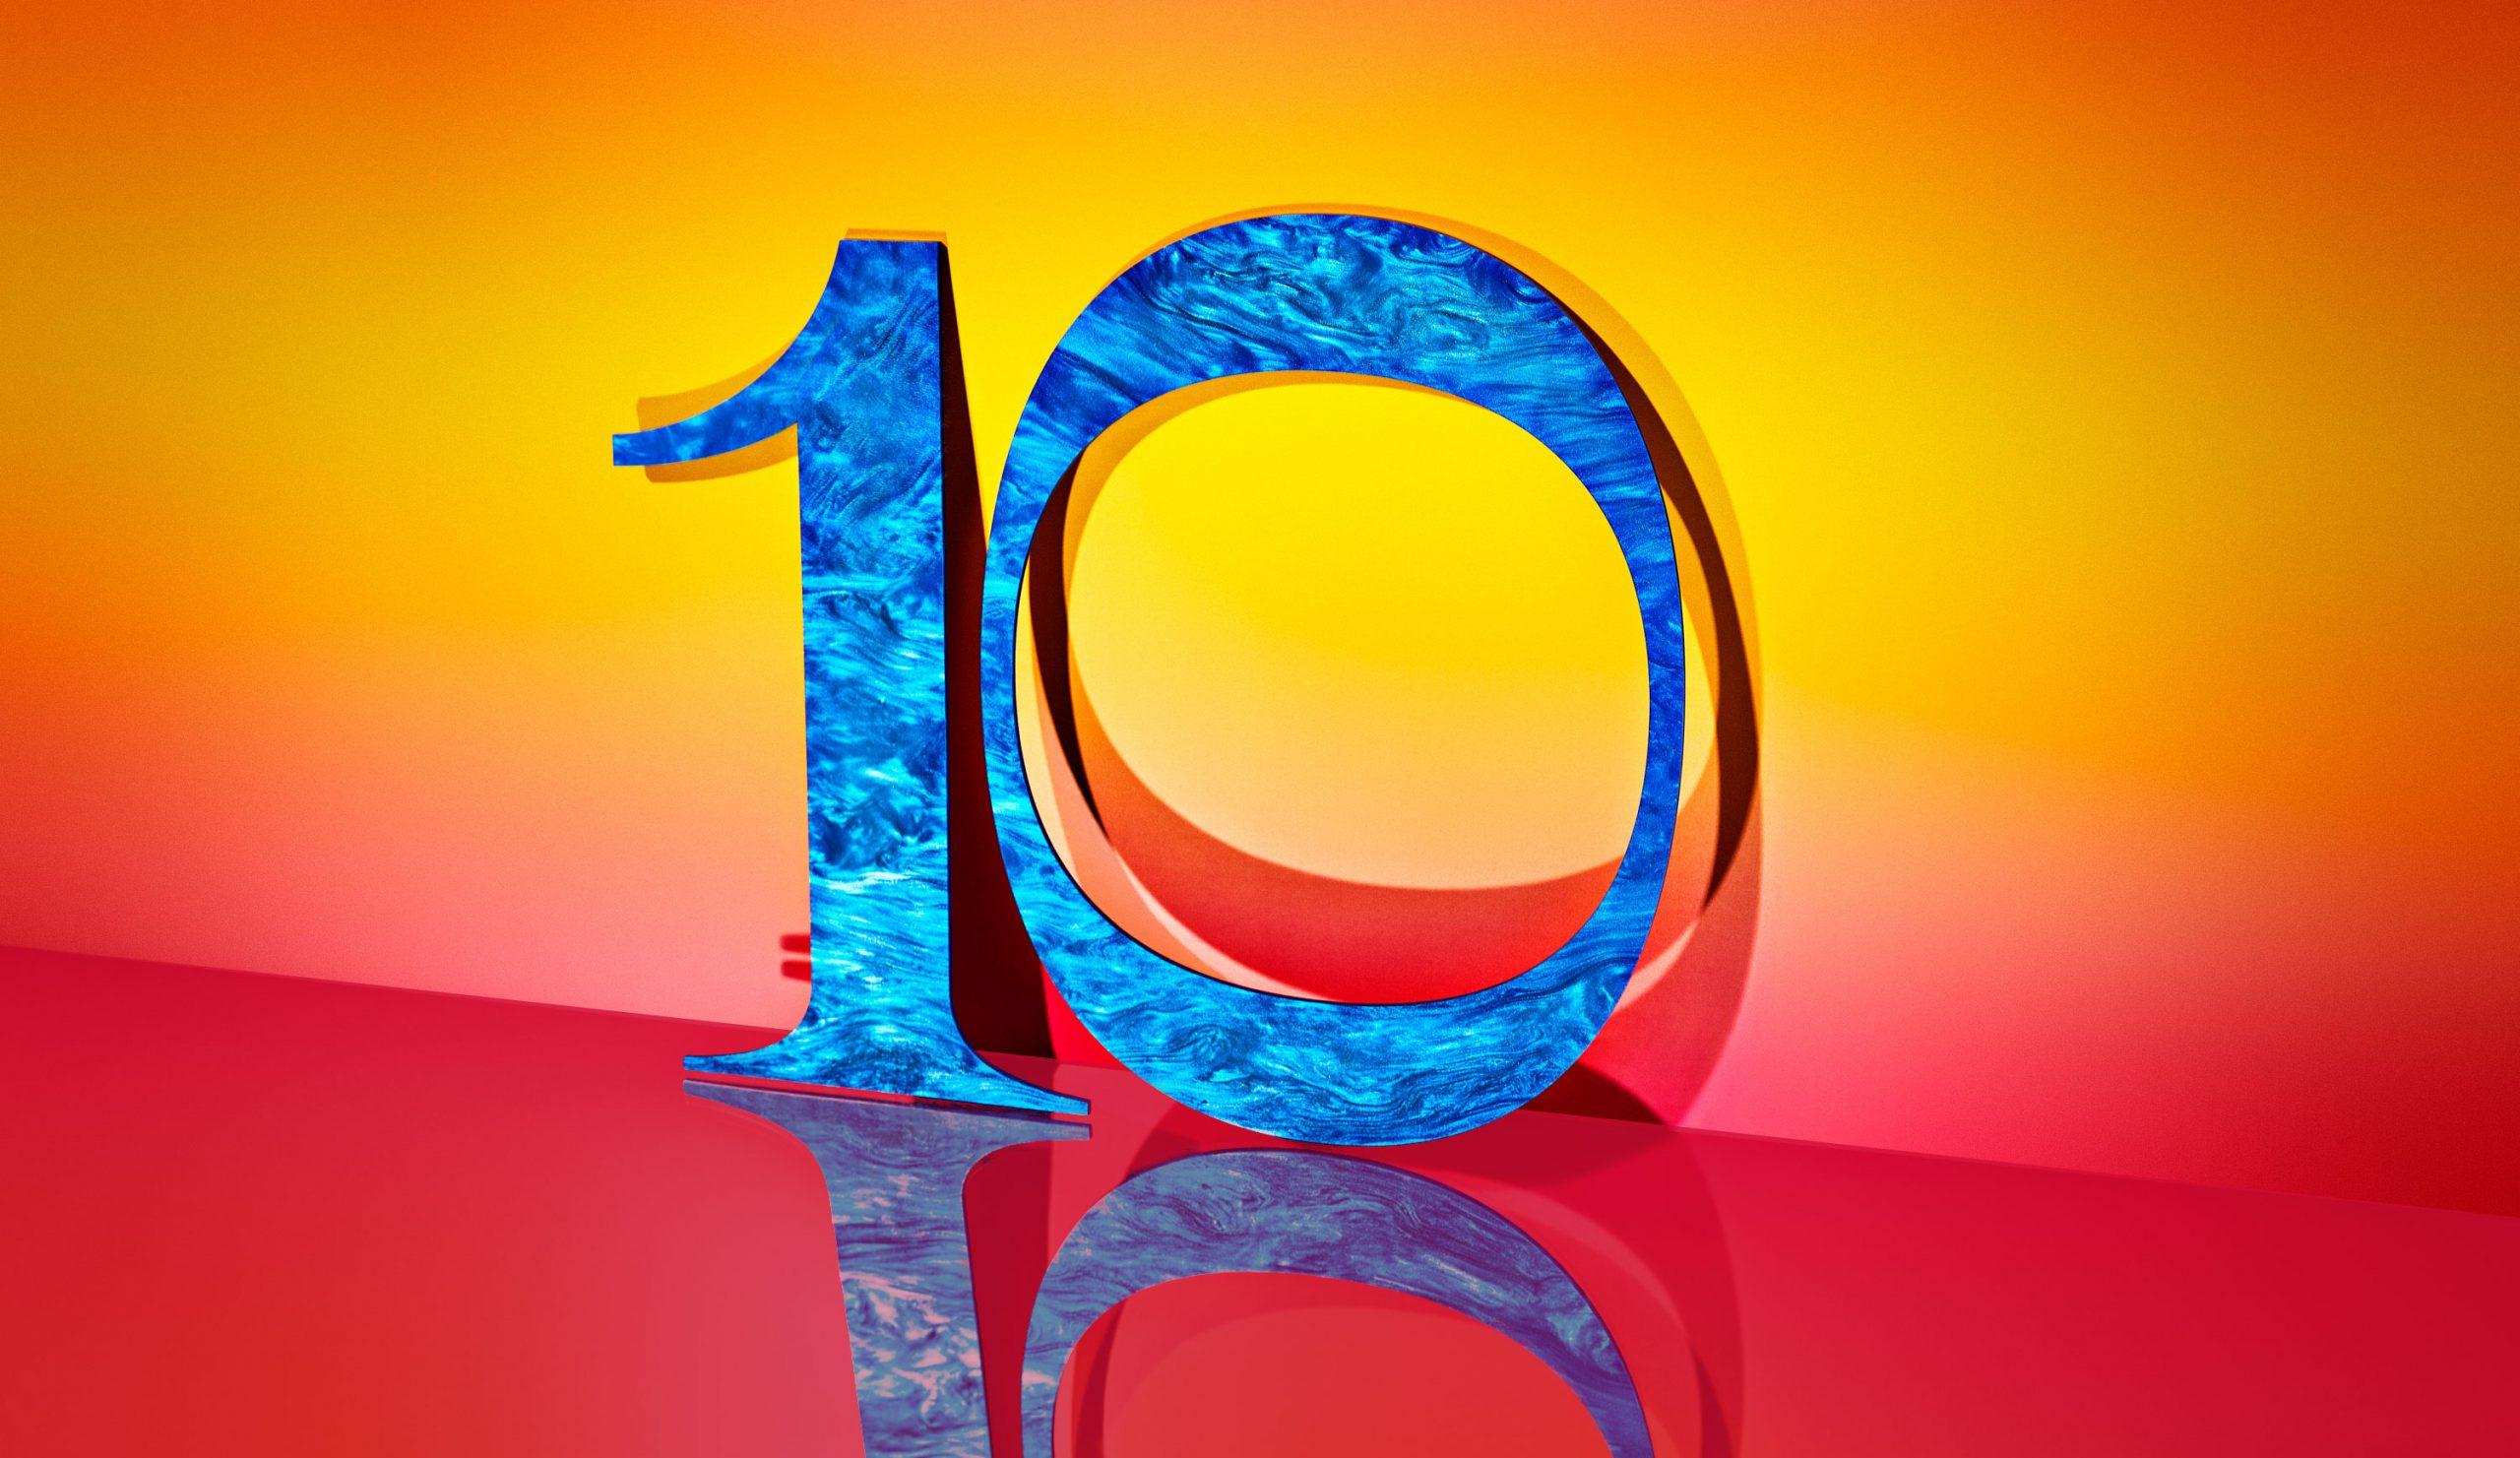 10 Breakthrough Technologies 2021